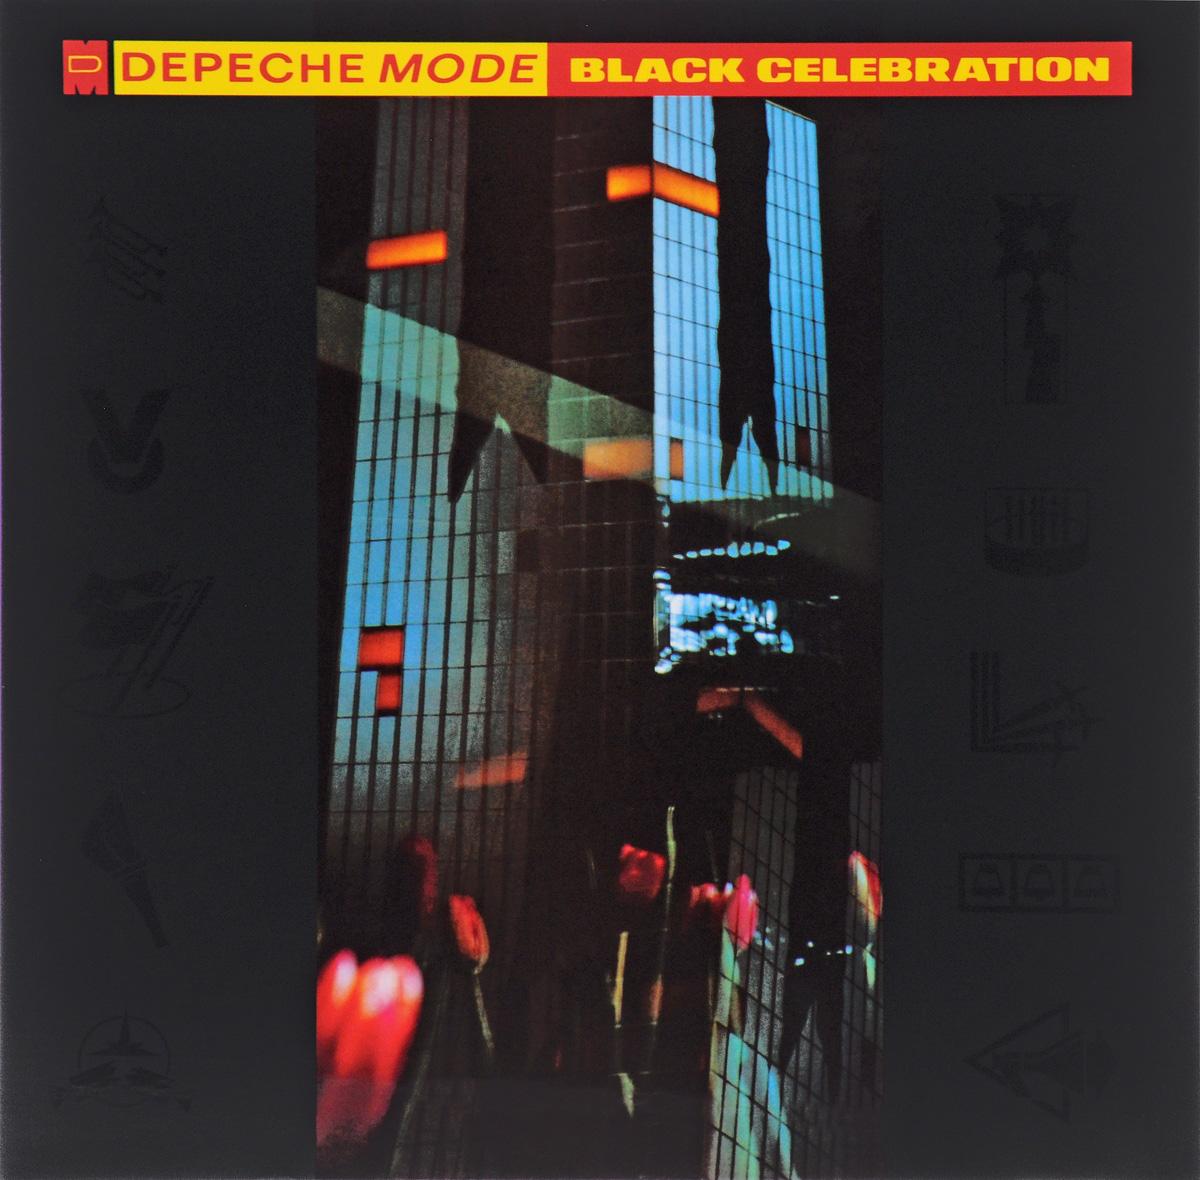 Depeche Mode Depeche Mode. Black Celebration (LP) 2017 new arrival wltoys q353 rc drone rtf 2 4g 6 axis air land sea mode headless mode one key return rc quadcopter orange